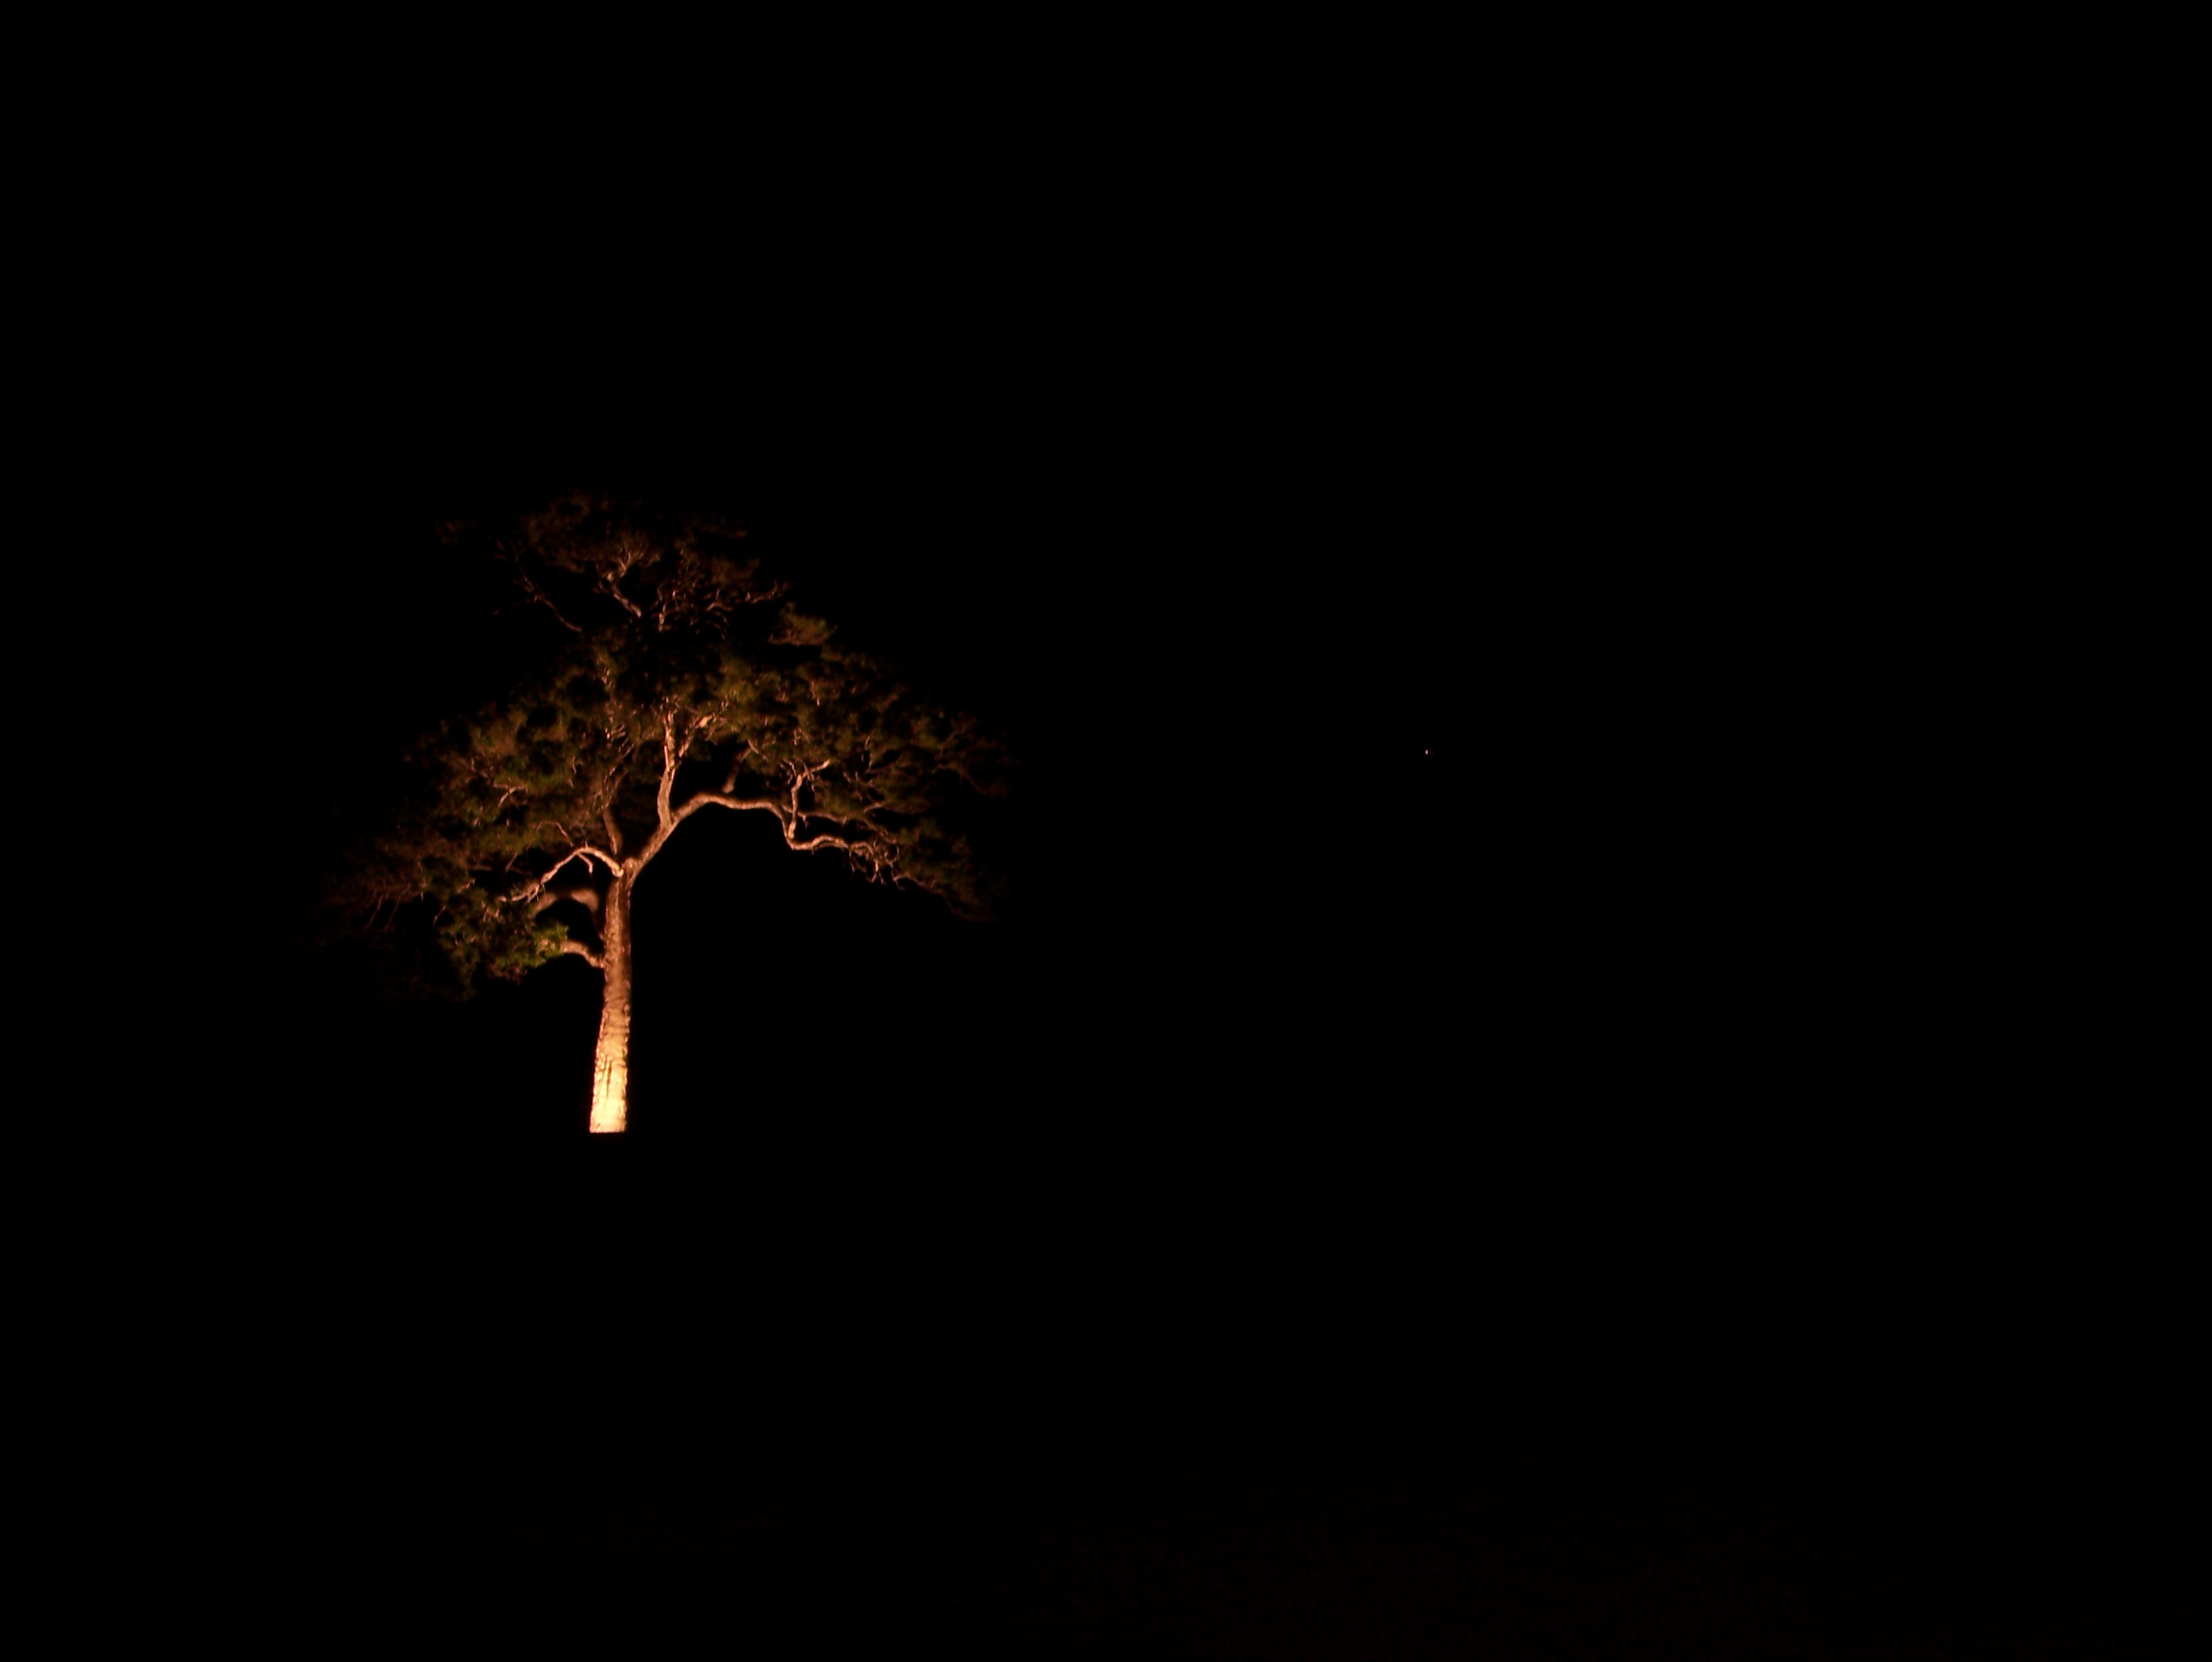 Lone Tree in the Dark